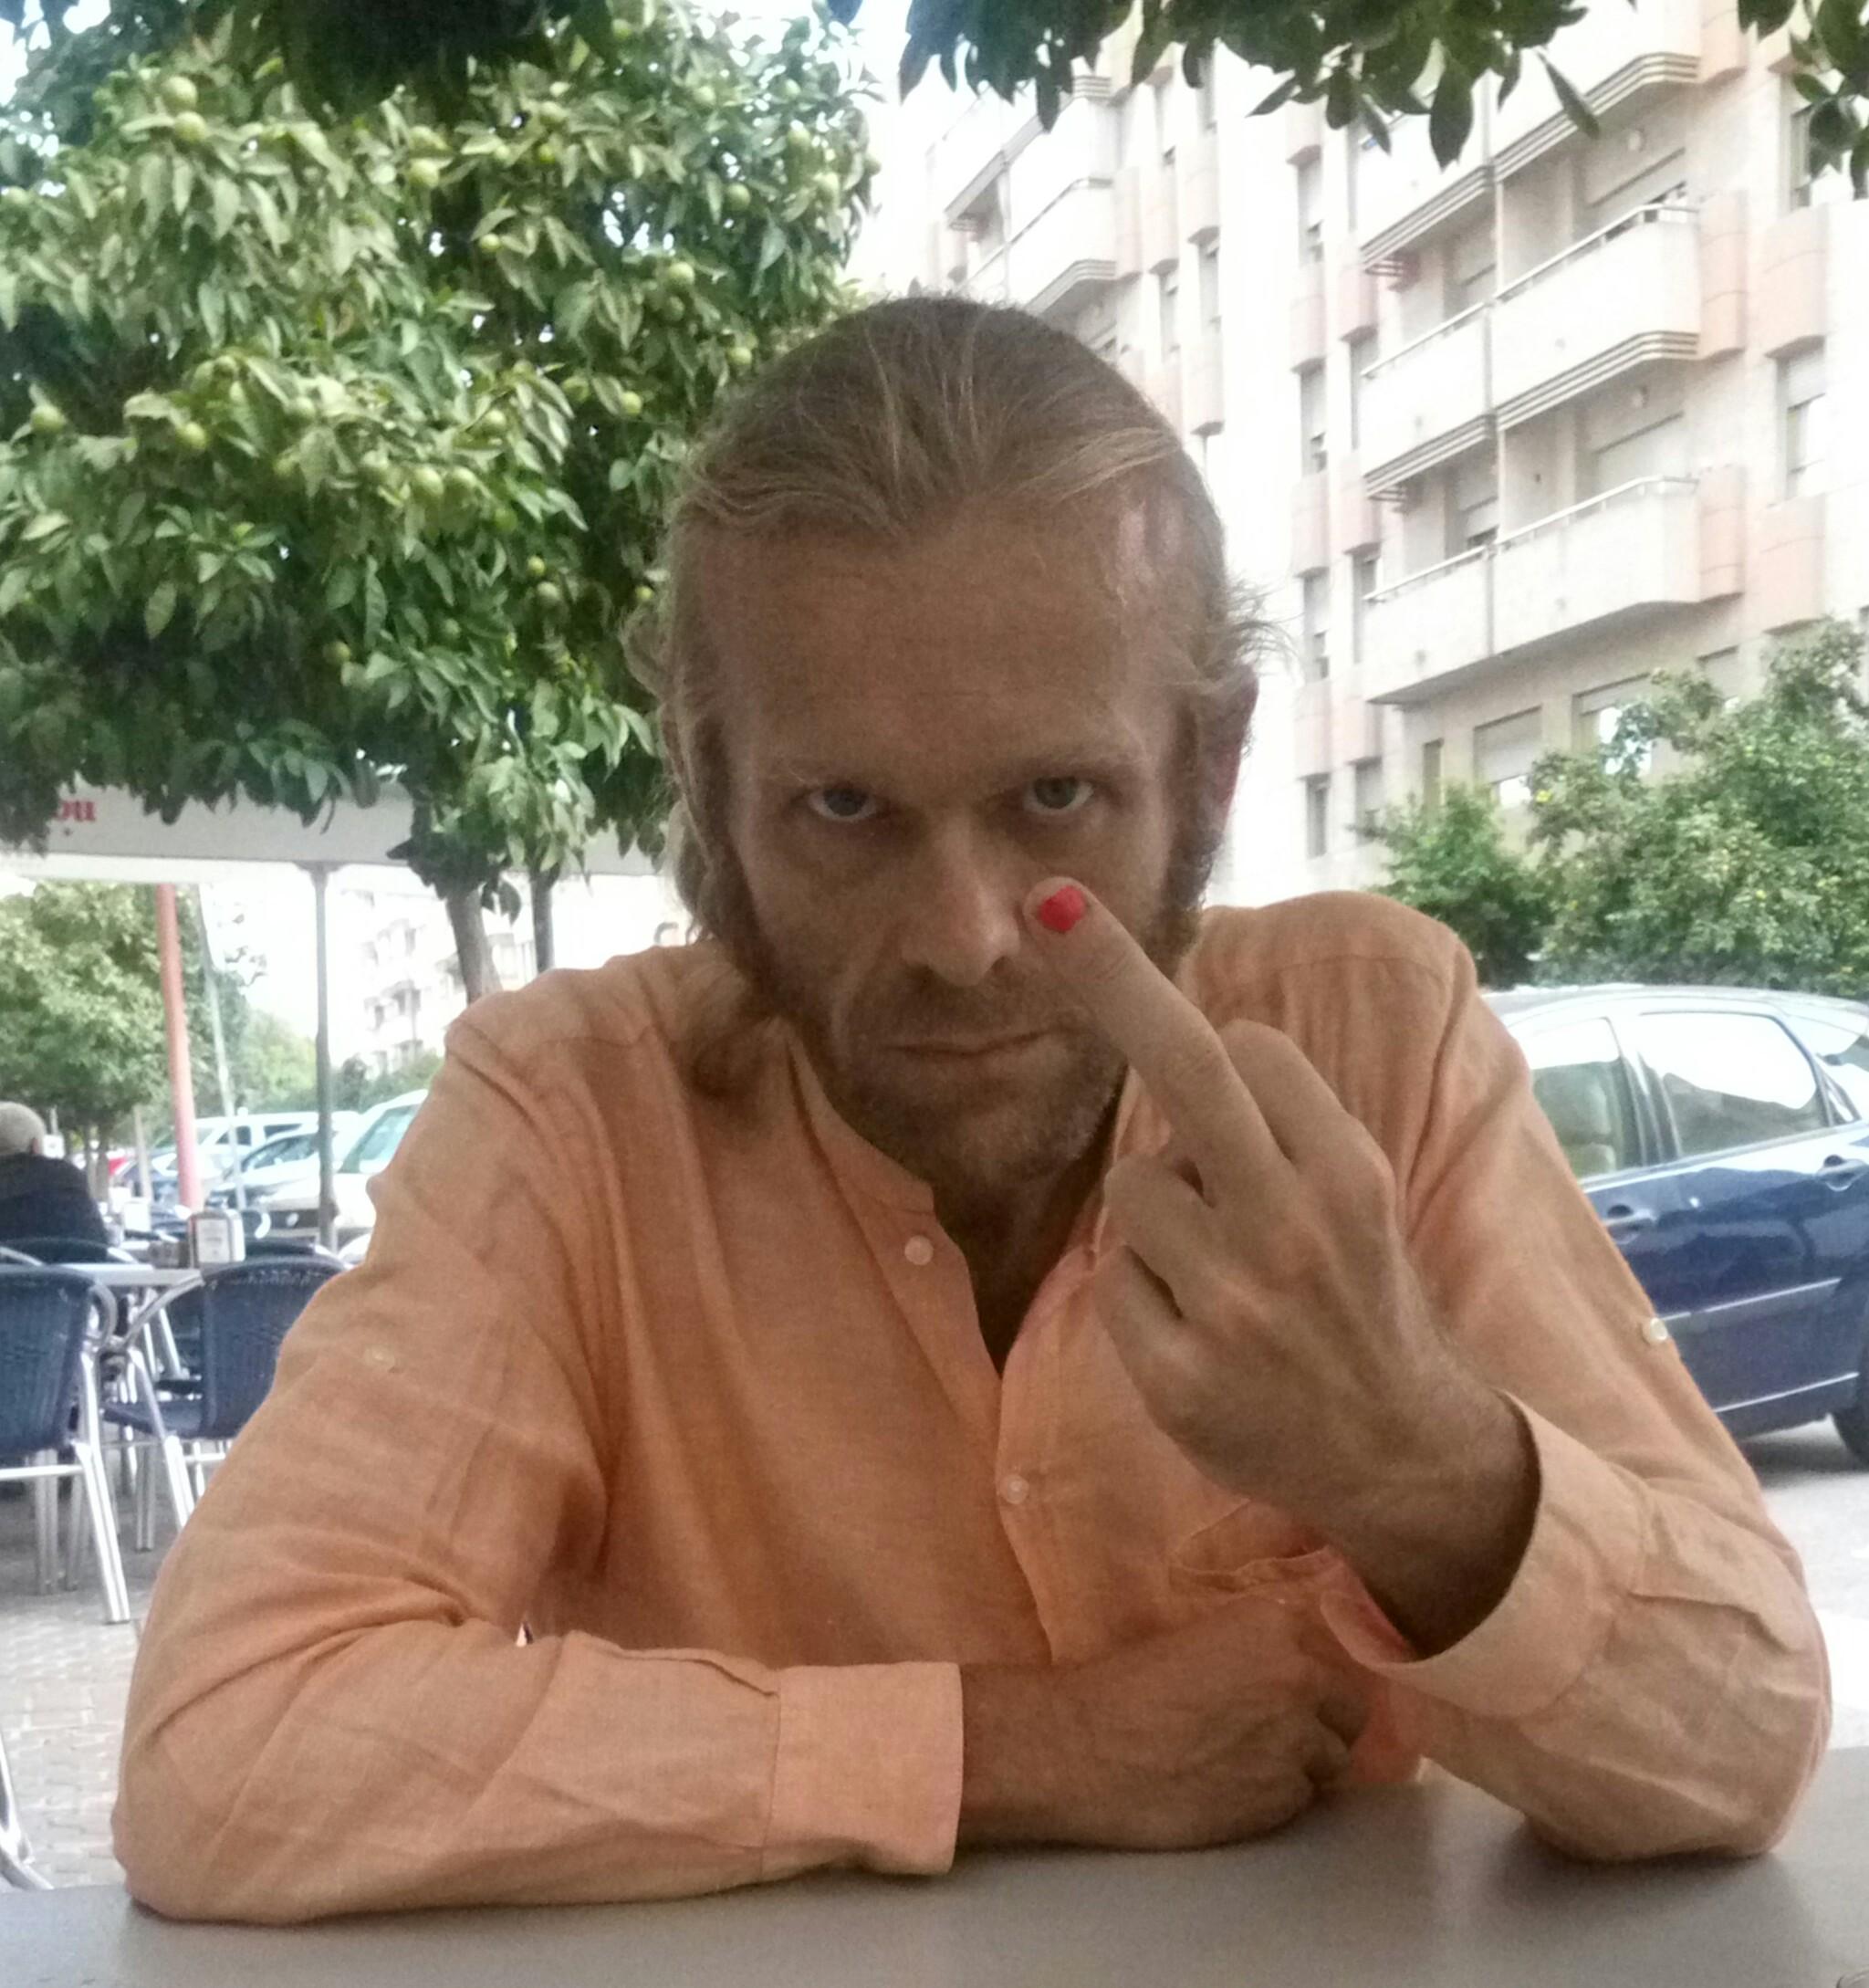 Polishedman: uña pintada contra abusos a menores